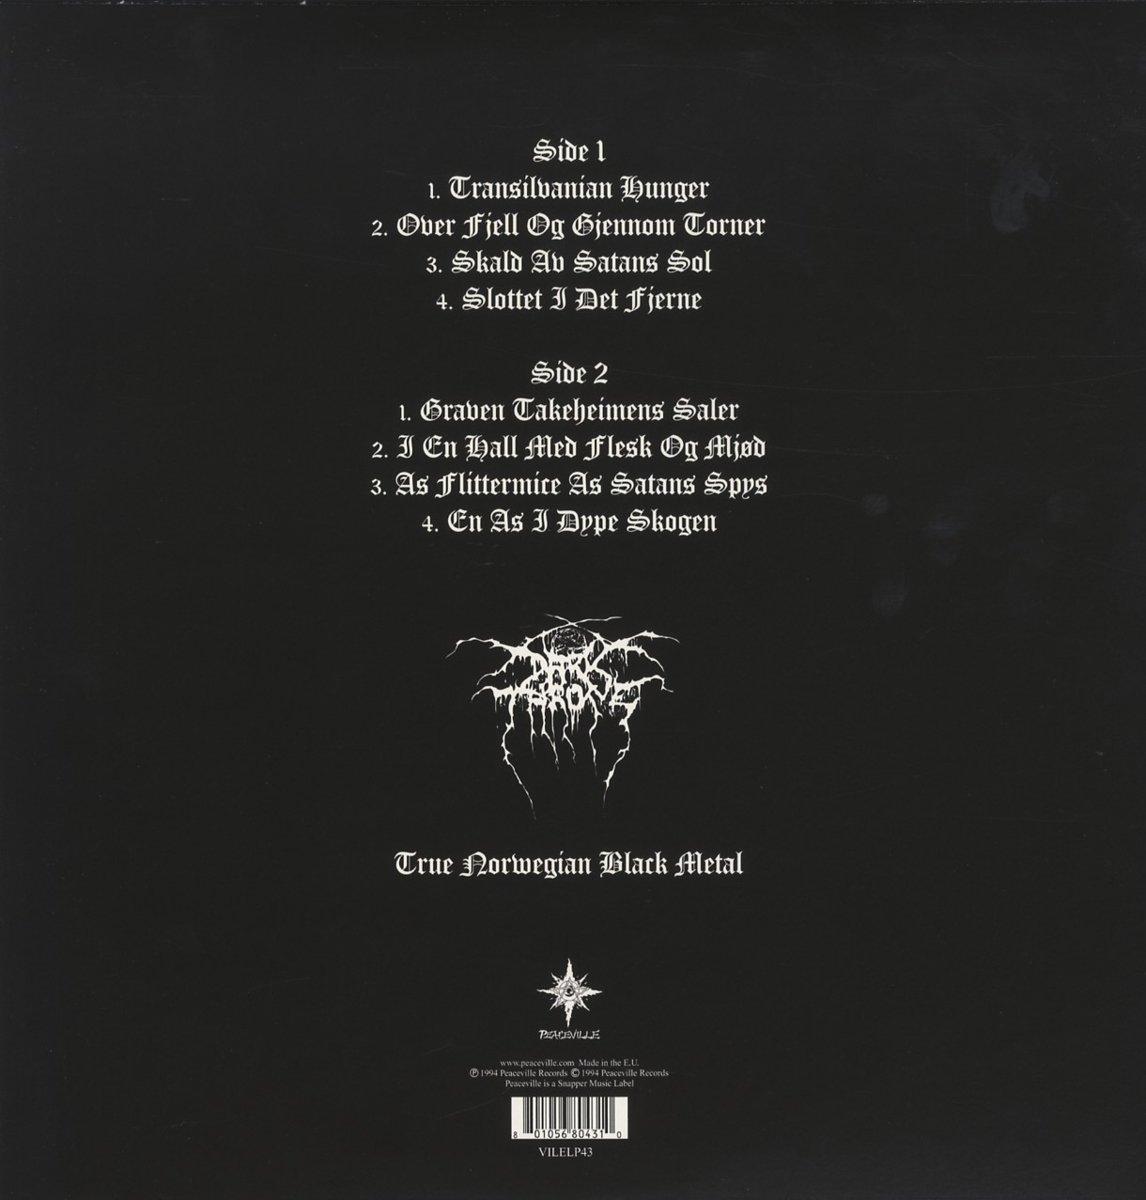 1ab901b1fde Transilvanian Hunger  Vinyl LP   Amazon.de  Musik